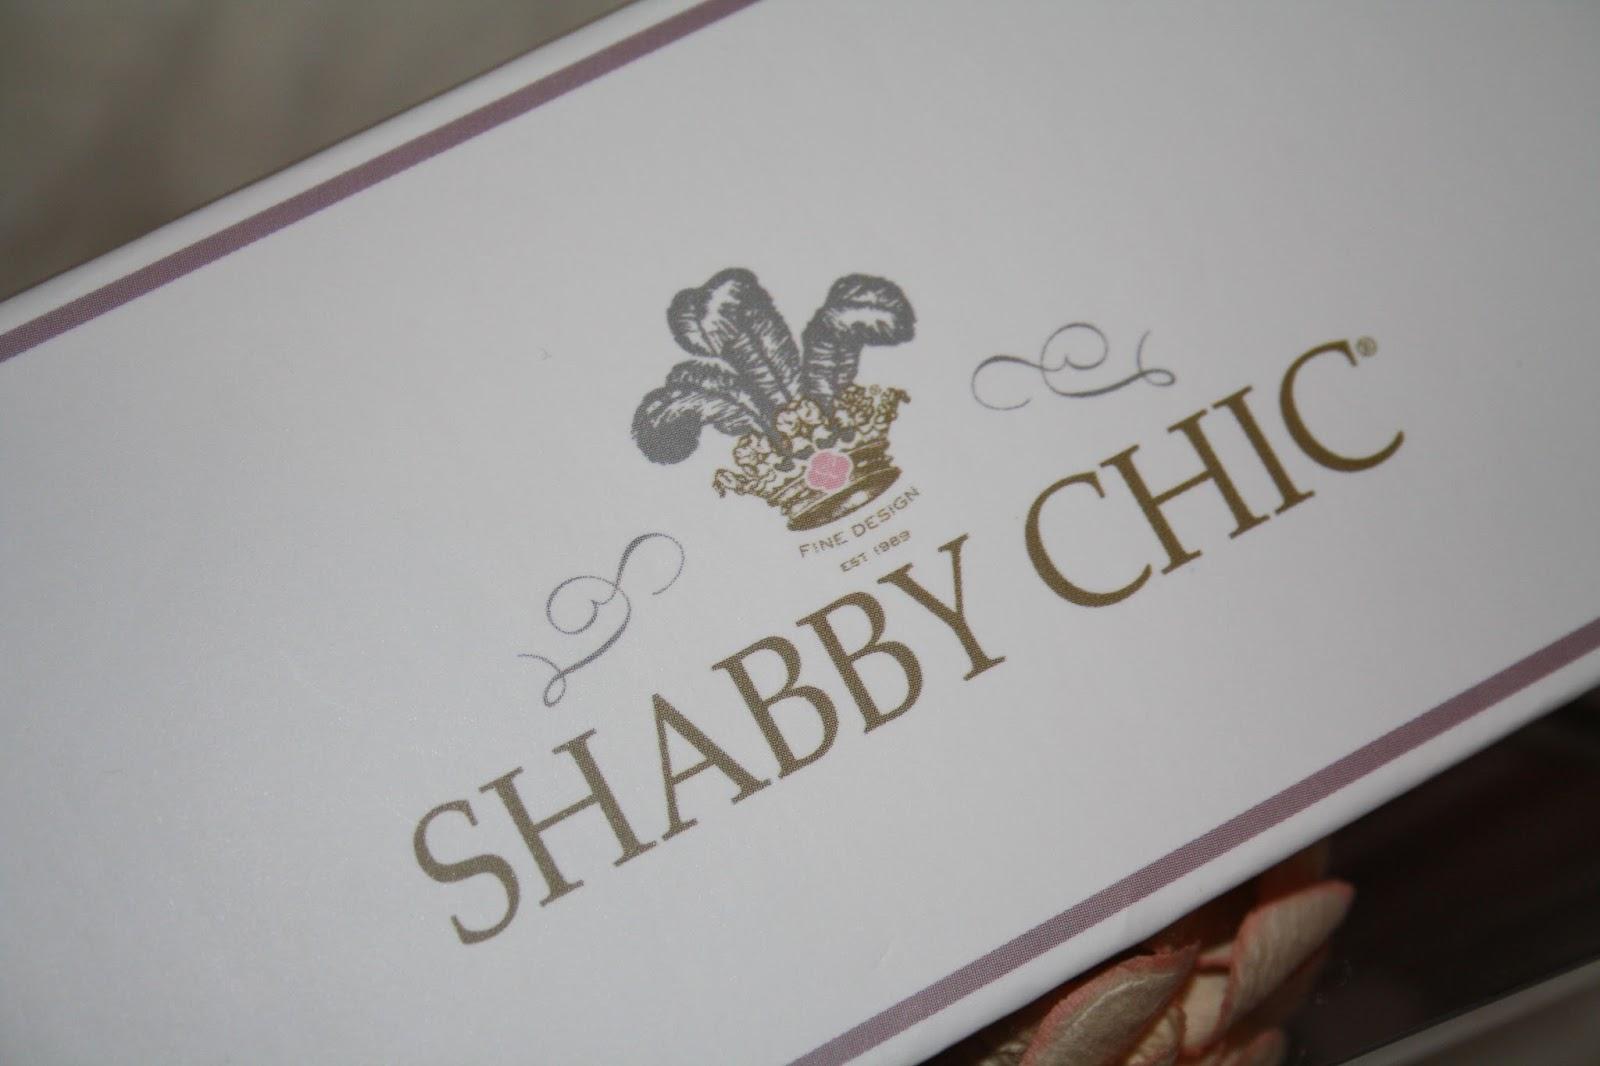 Shabby Chic from the flower Garden